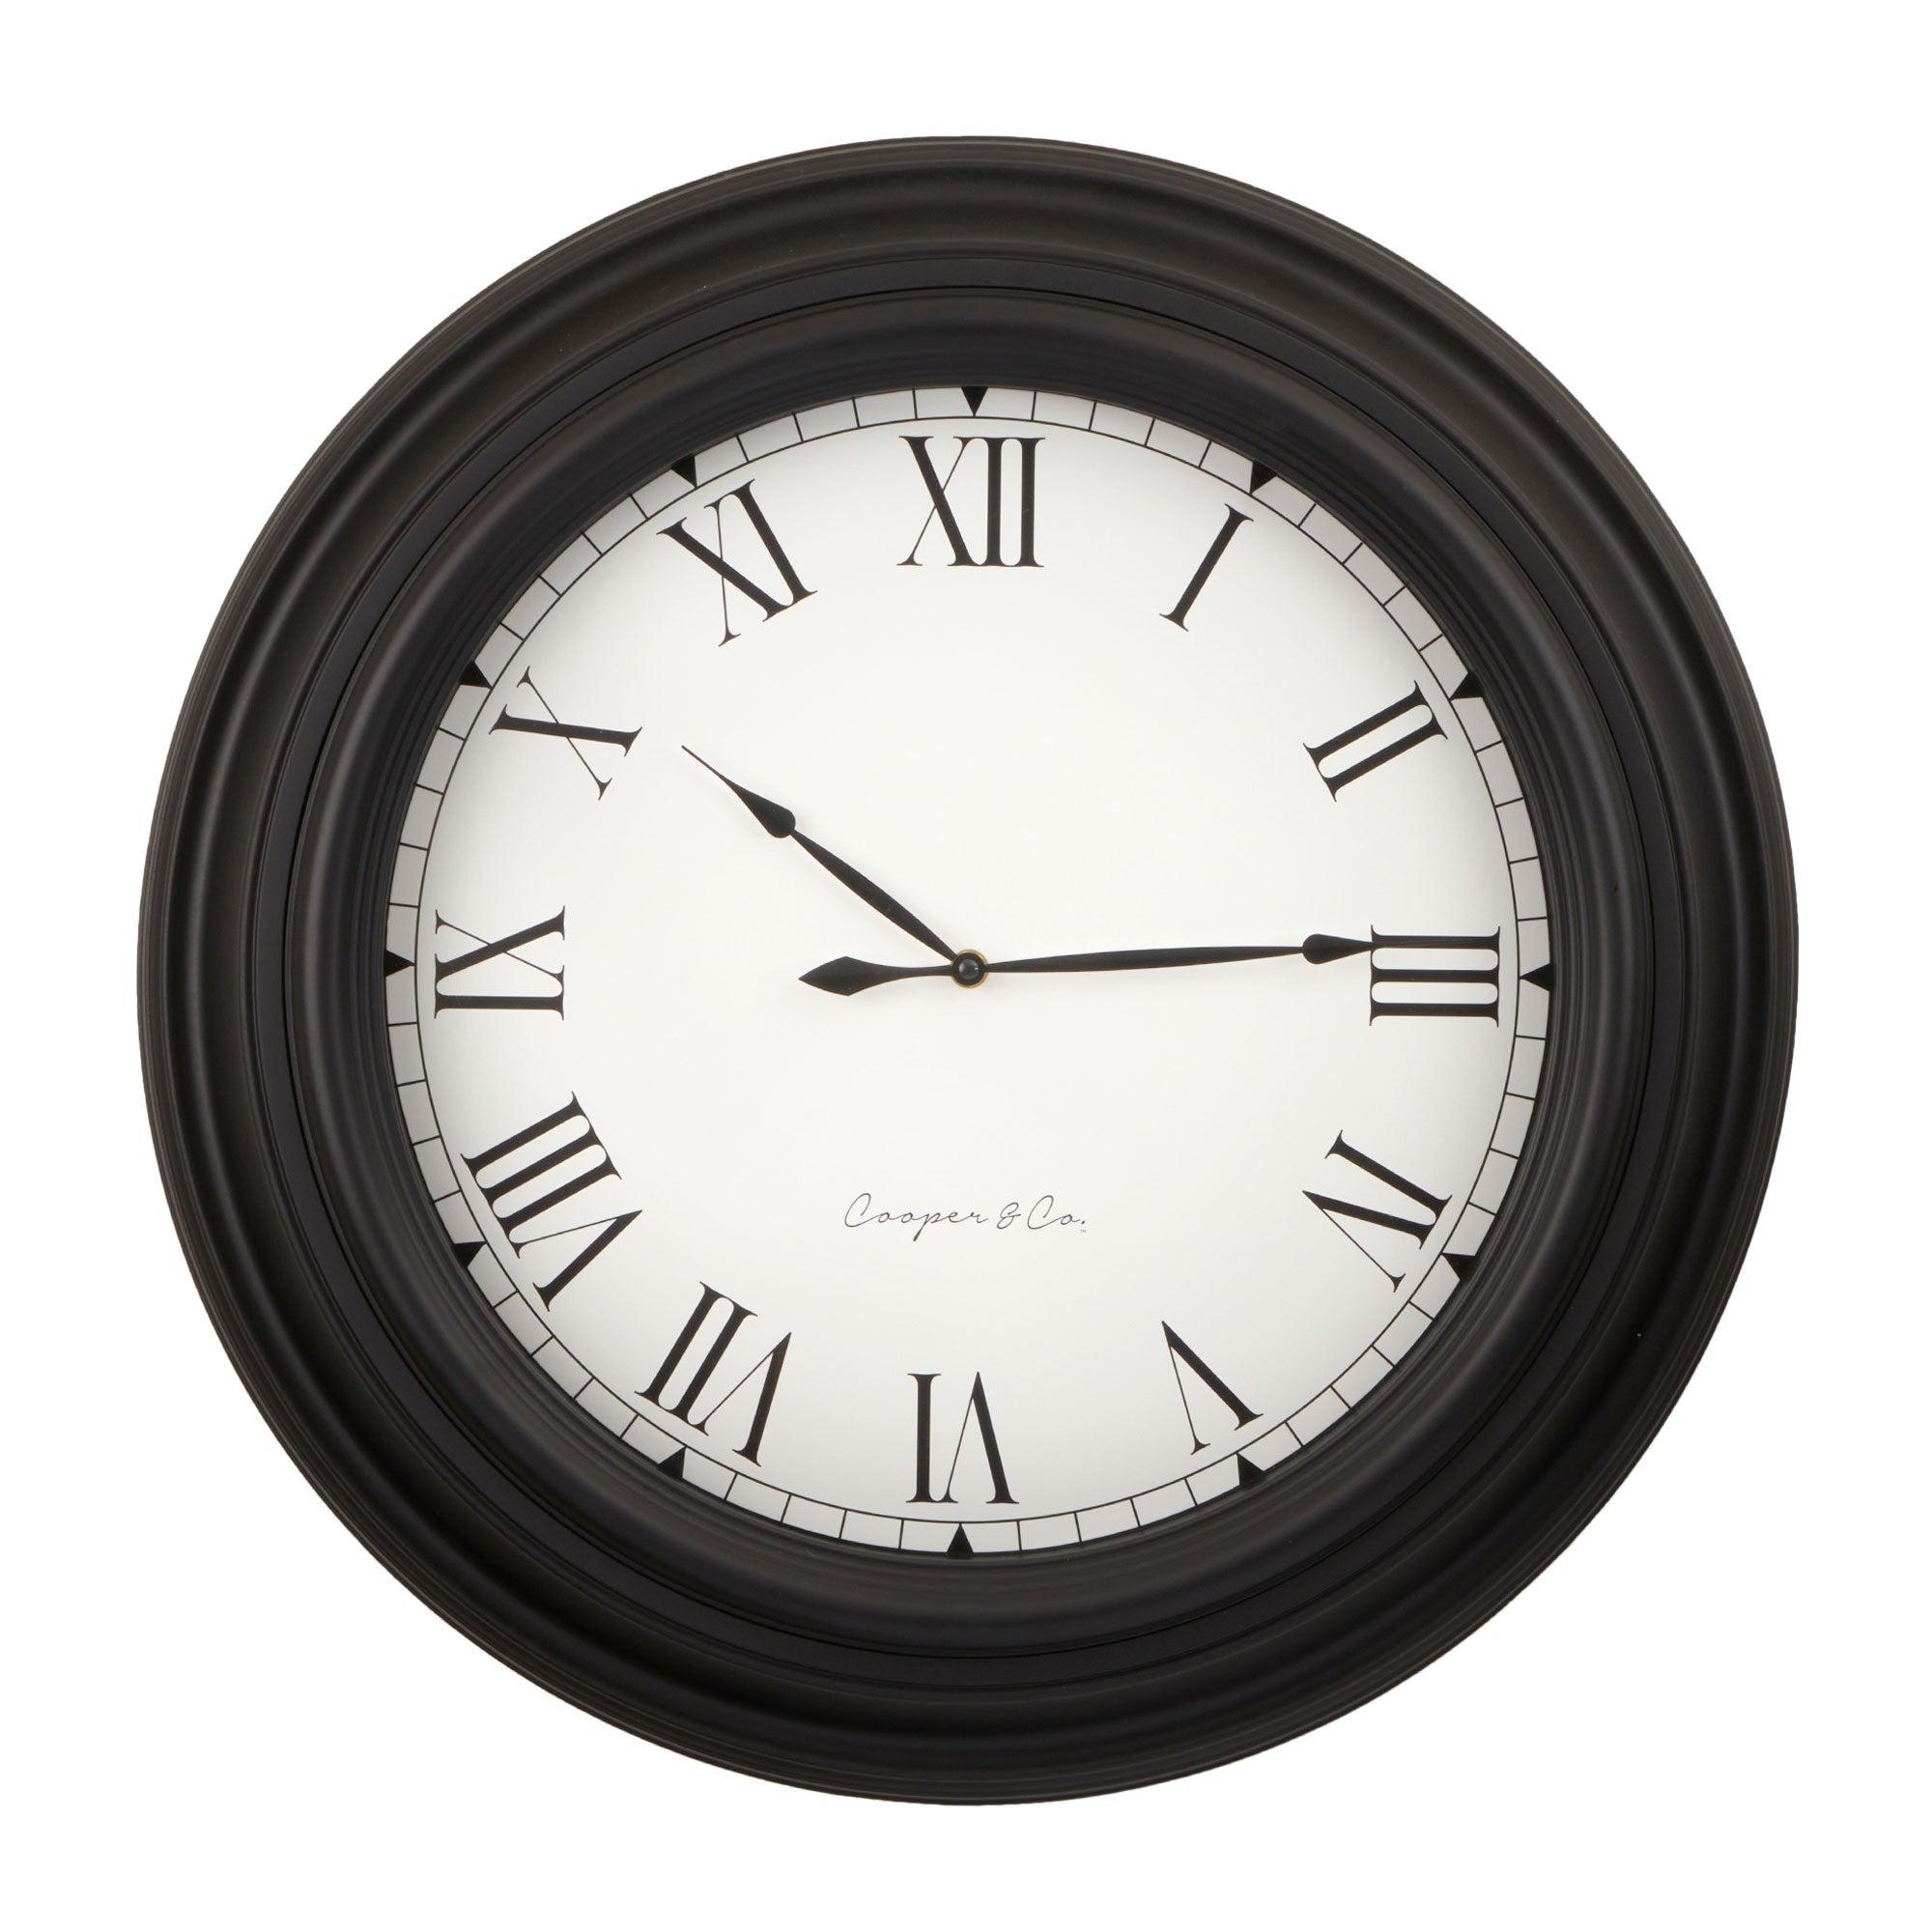 Cooper & Co. 60cm Black Jumbo Wall Clock